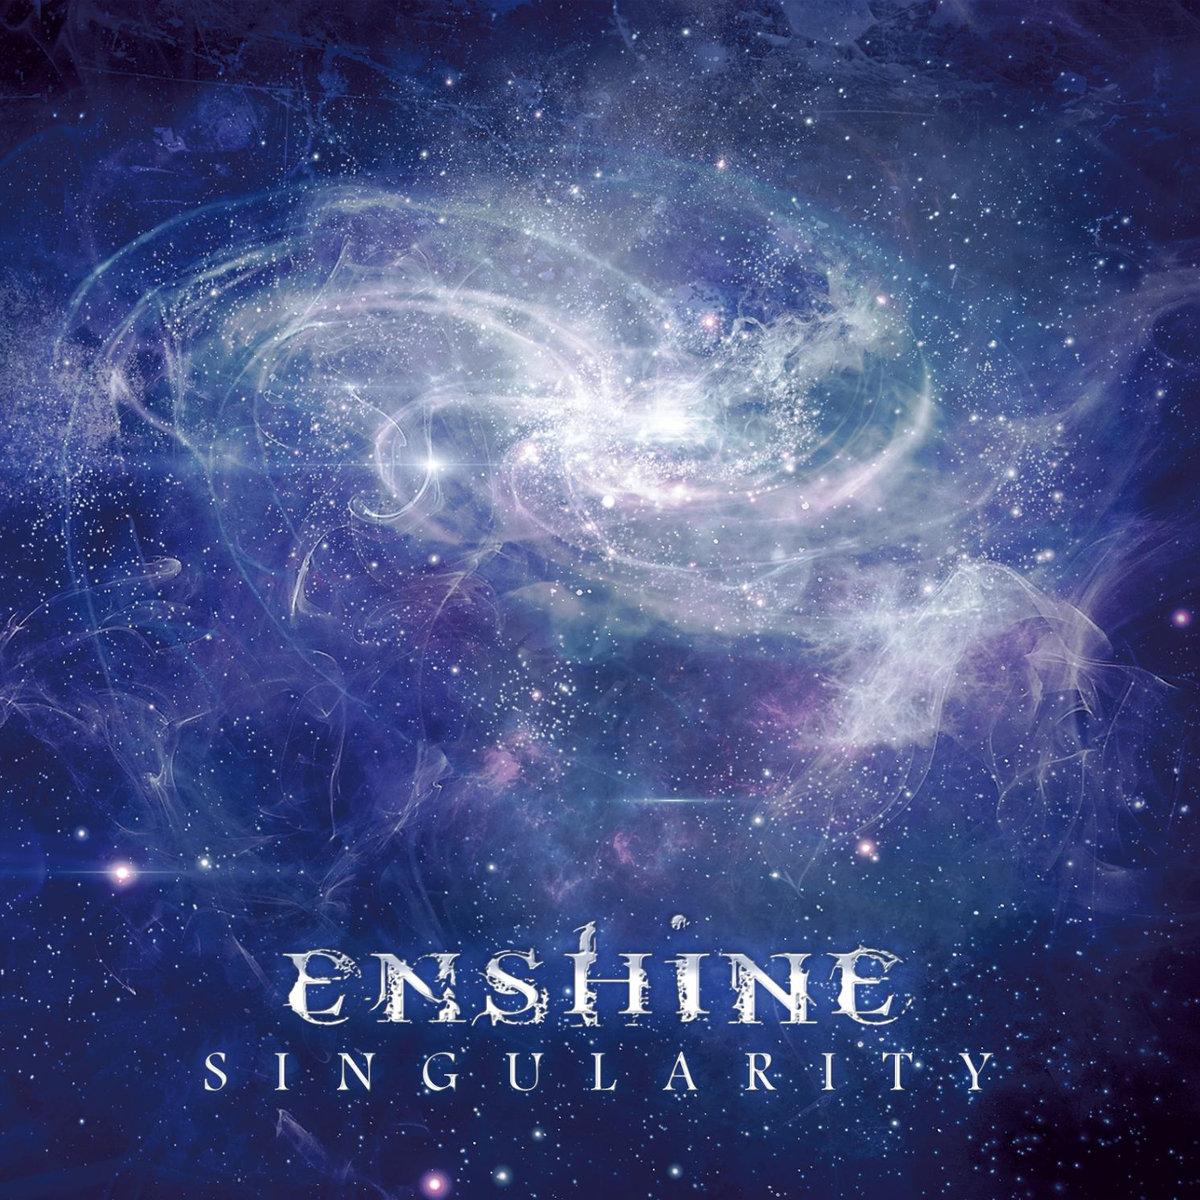 Enshine: Singularity